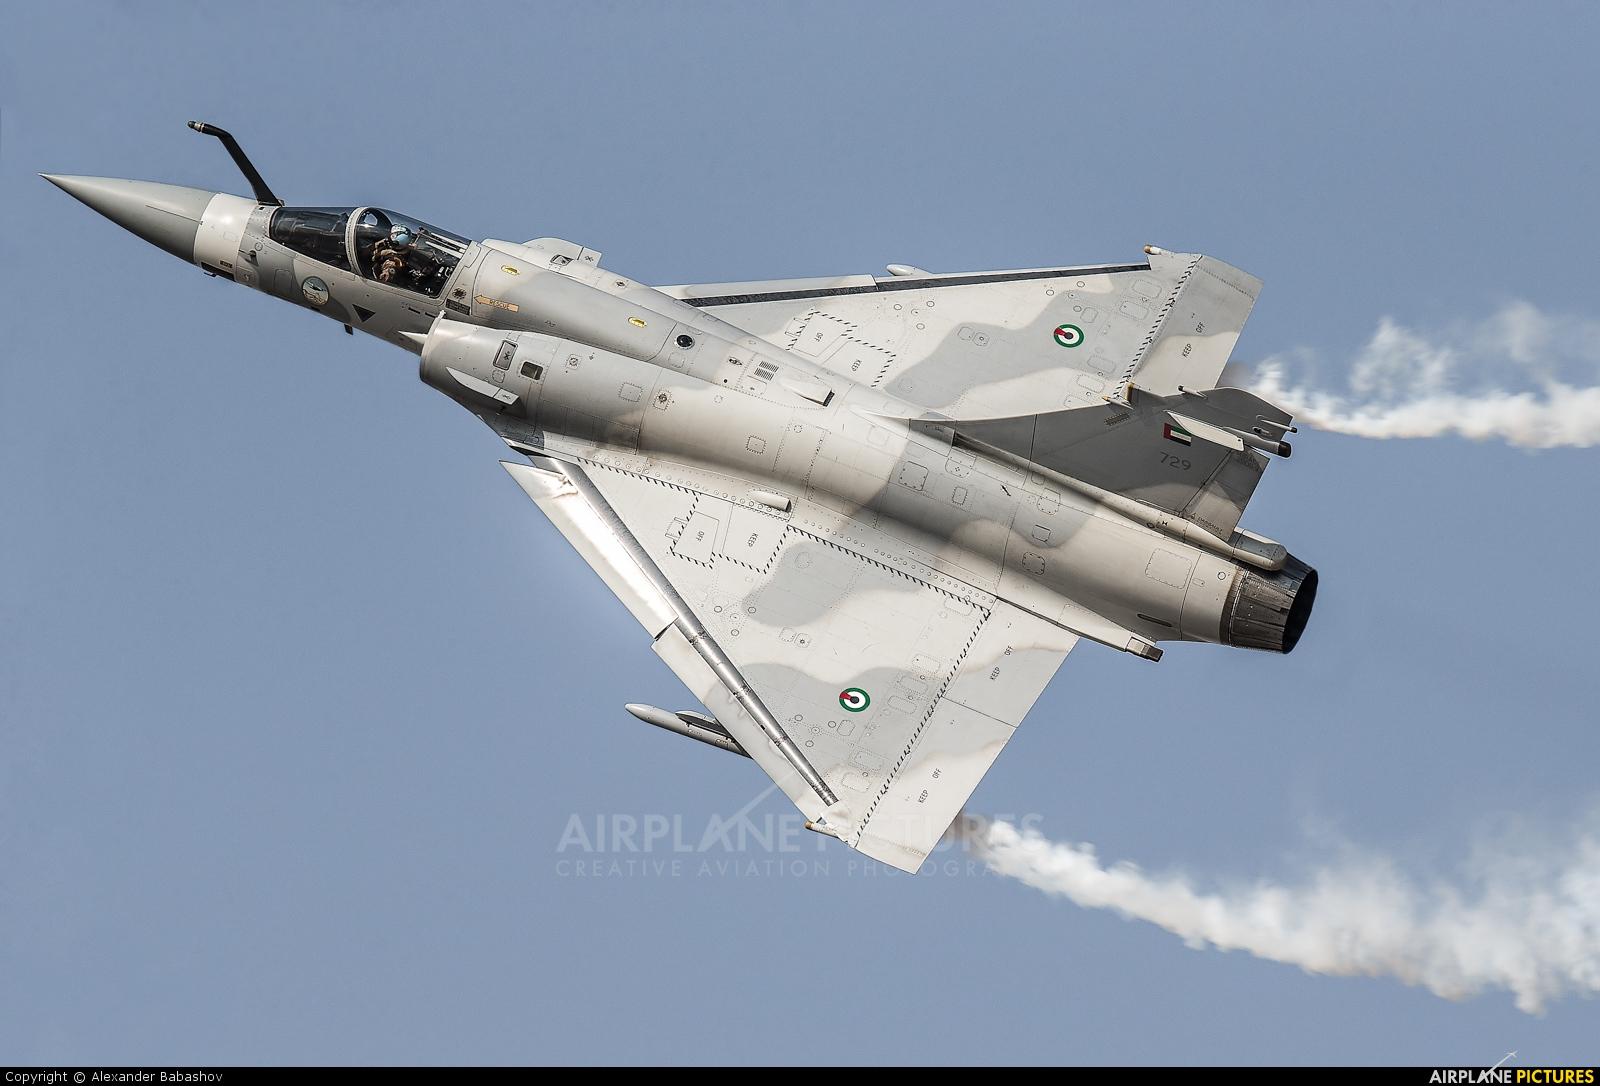 United Arab Emirates - Air Force 729 aircraft at Jebel Ali Al Maktoum Intl